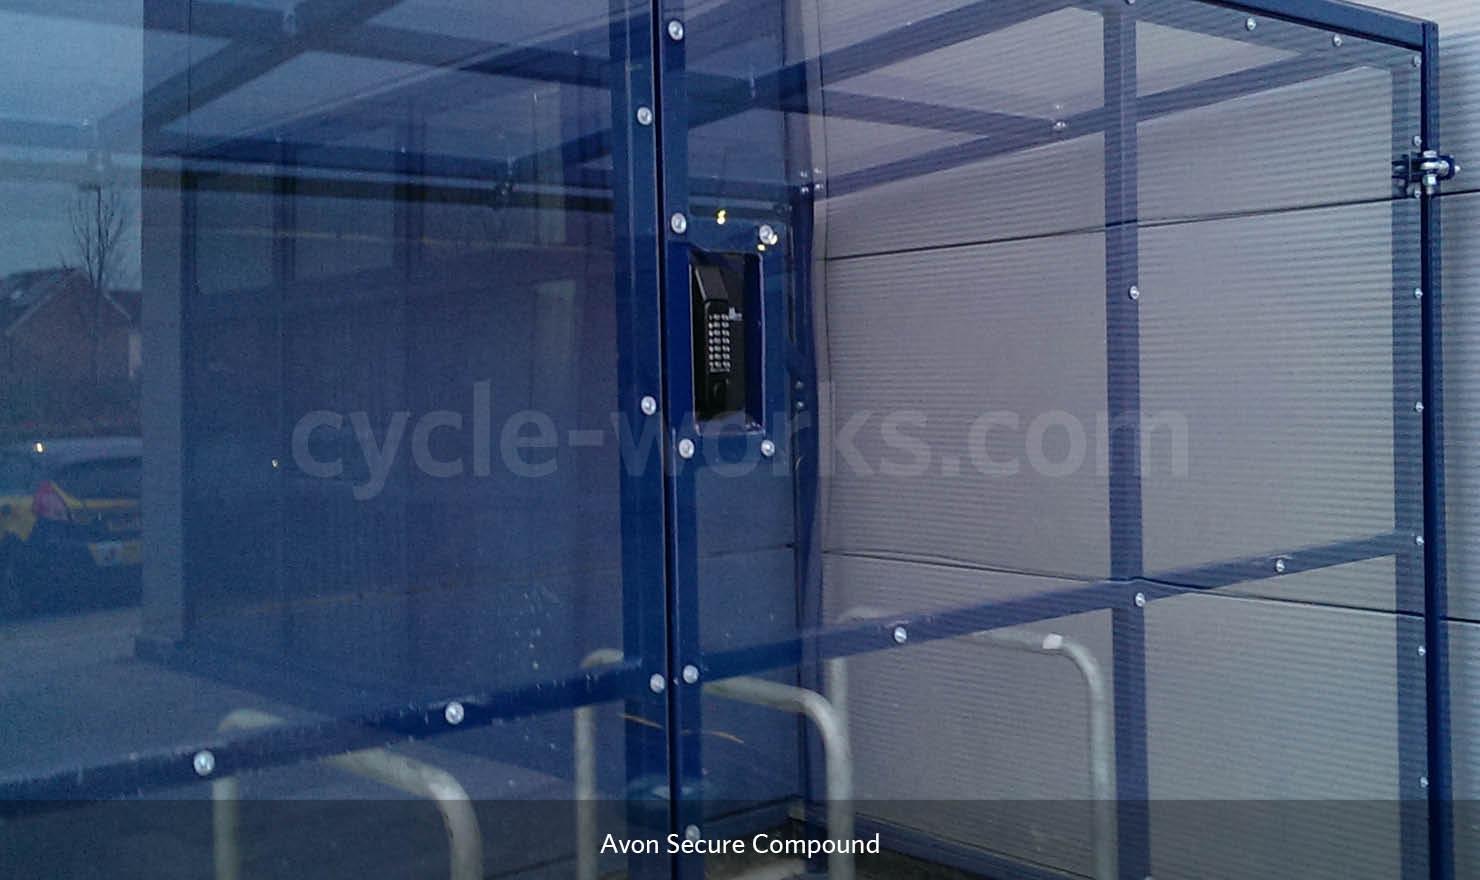 Avon Bicycle Shelter